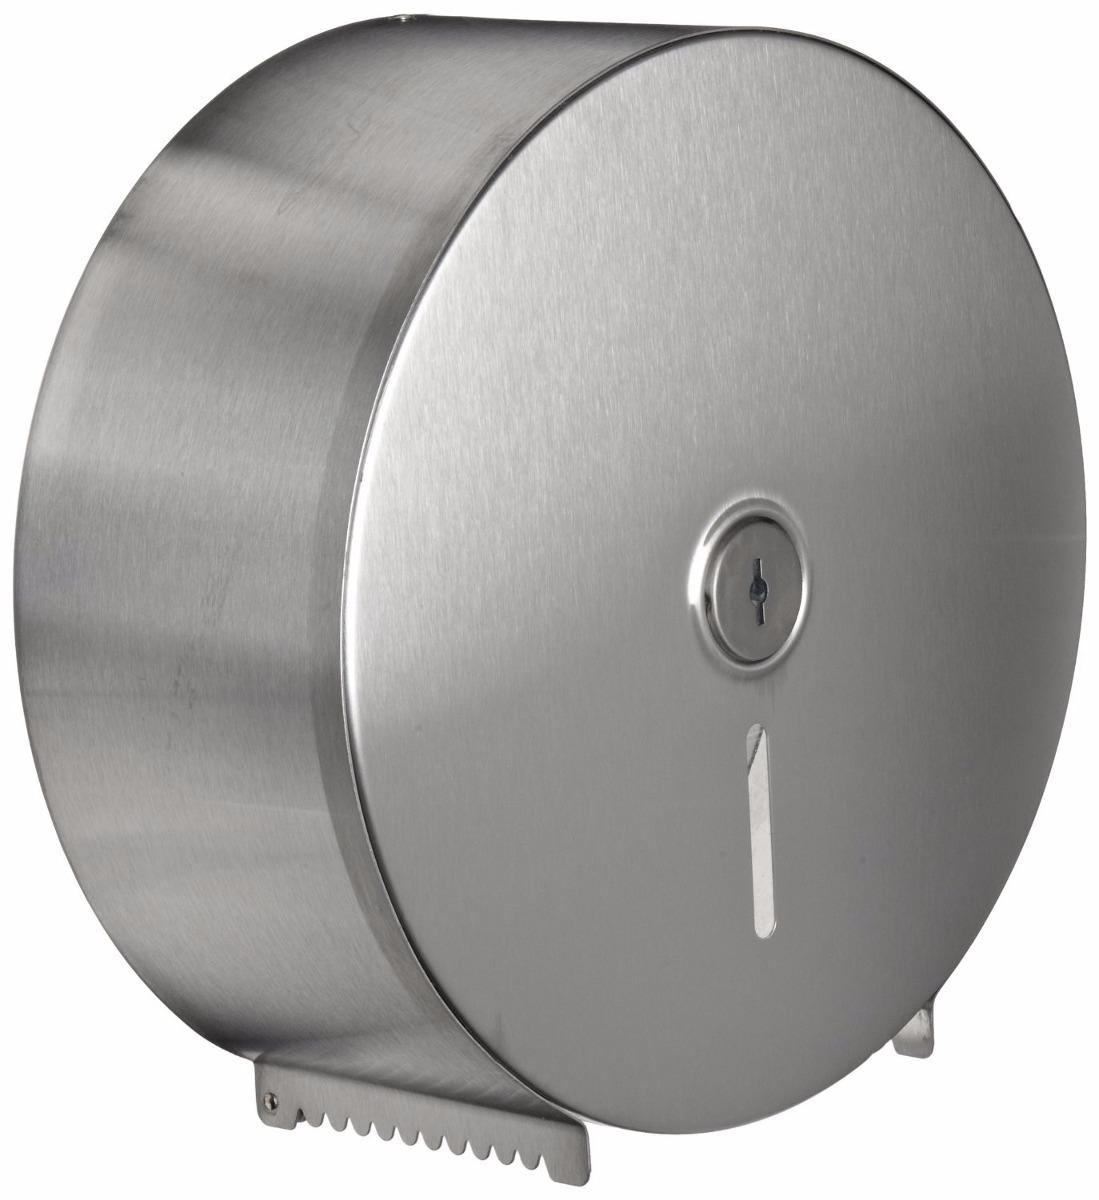 Dispensador De Papel Higienico Bobrick 2890 Nb 3 799 00 En  # Muebles Bobrick